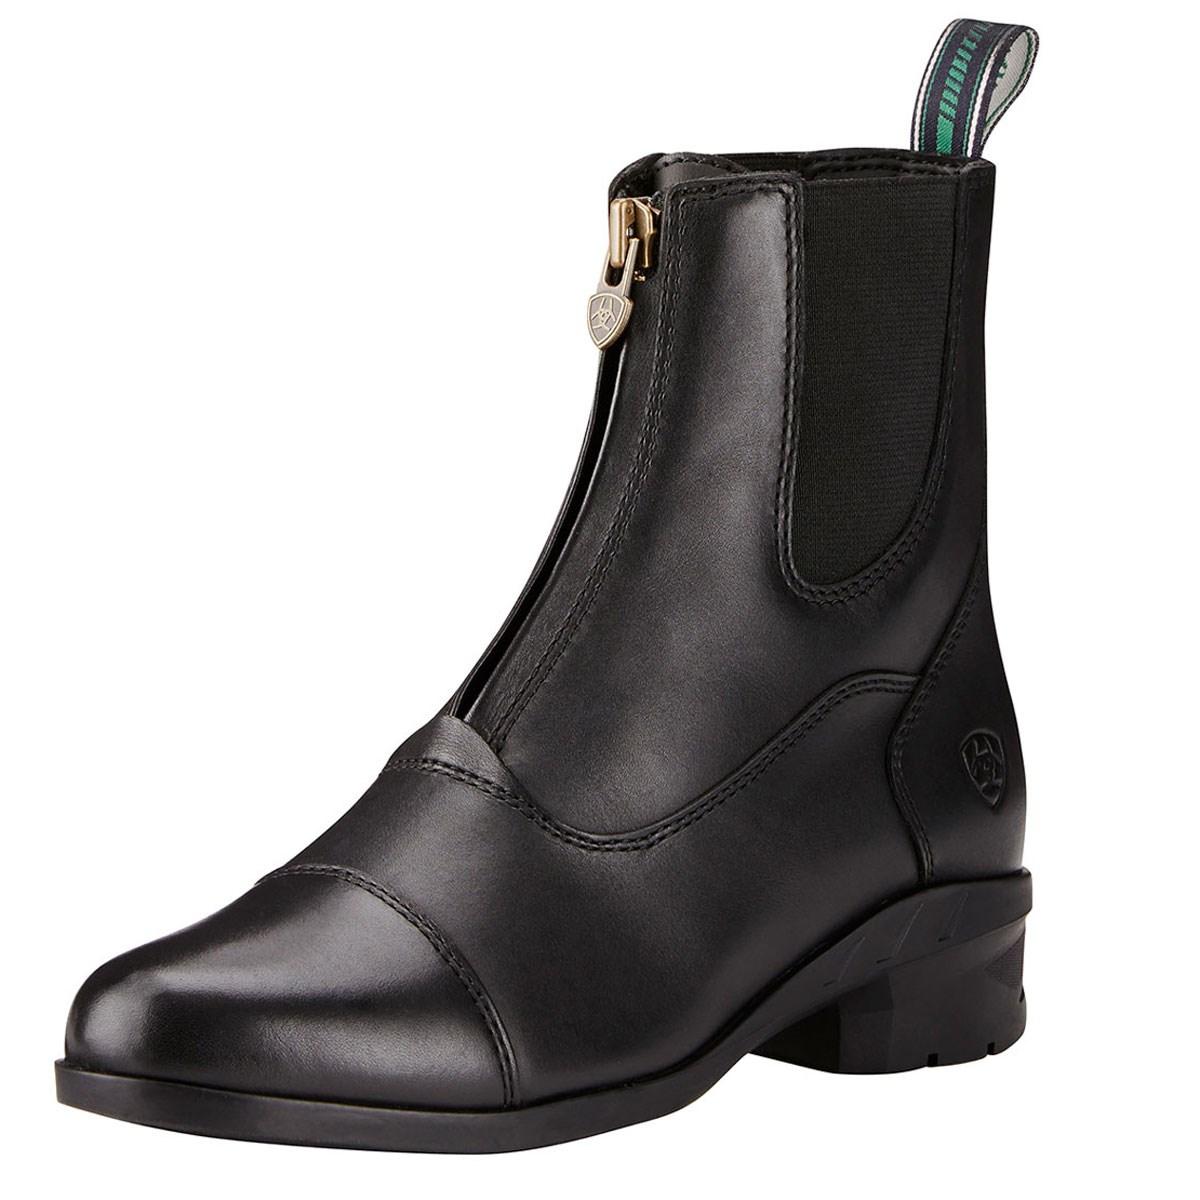 ac63fbeb7fbc Ariat Heritage IV Zip Womens Short Boot - Black - Redpost Equestrian